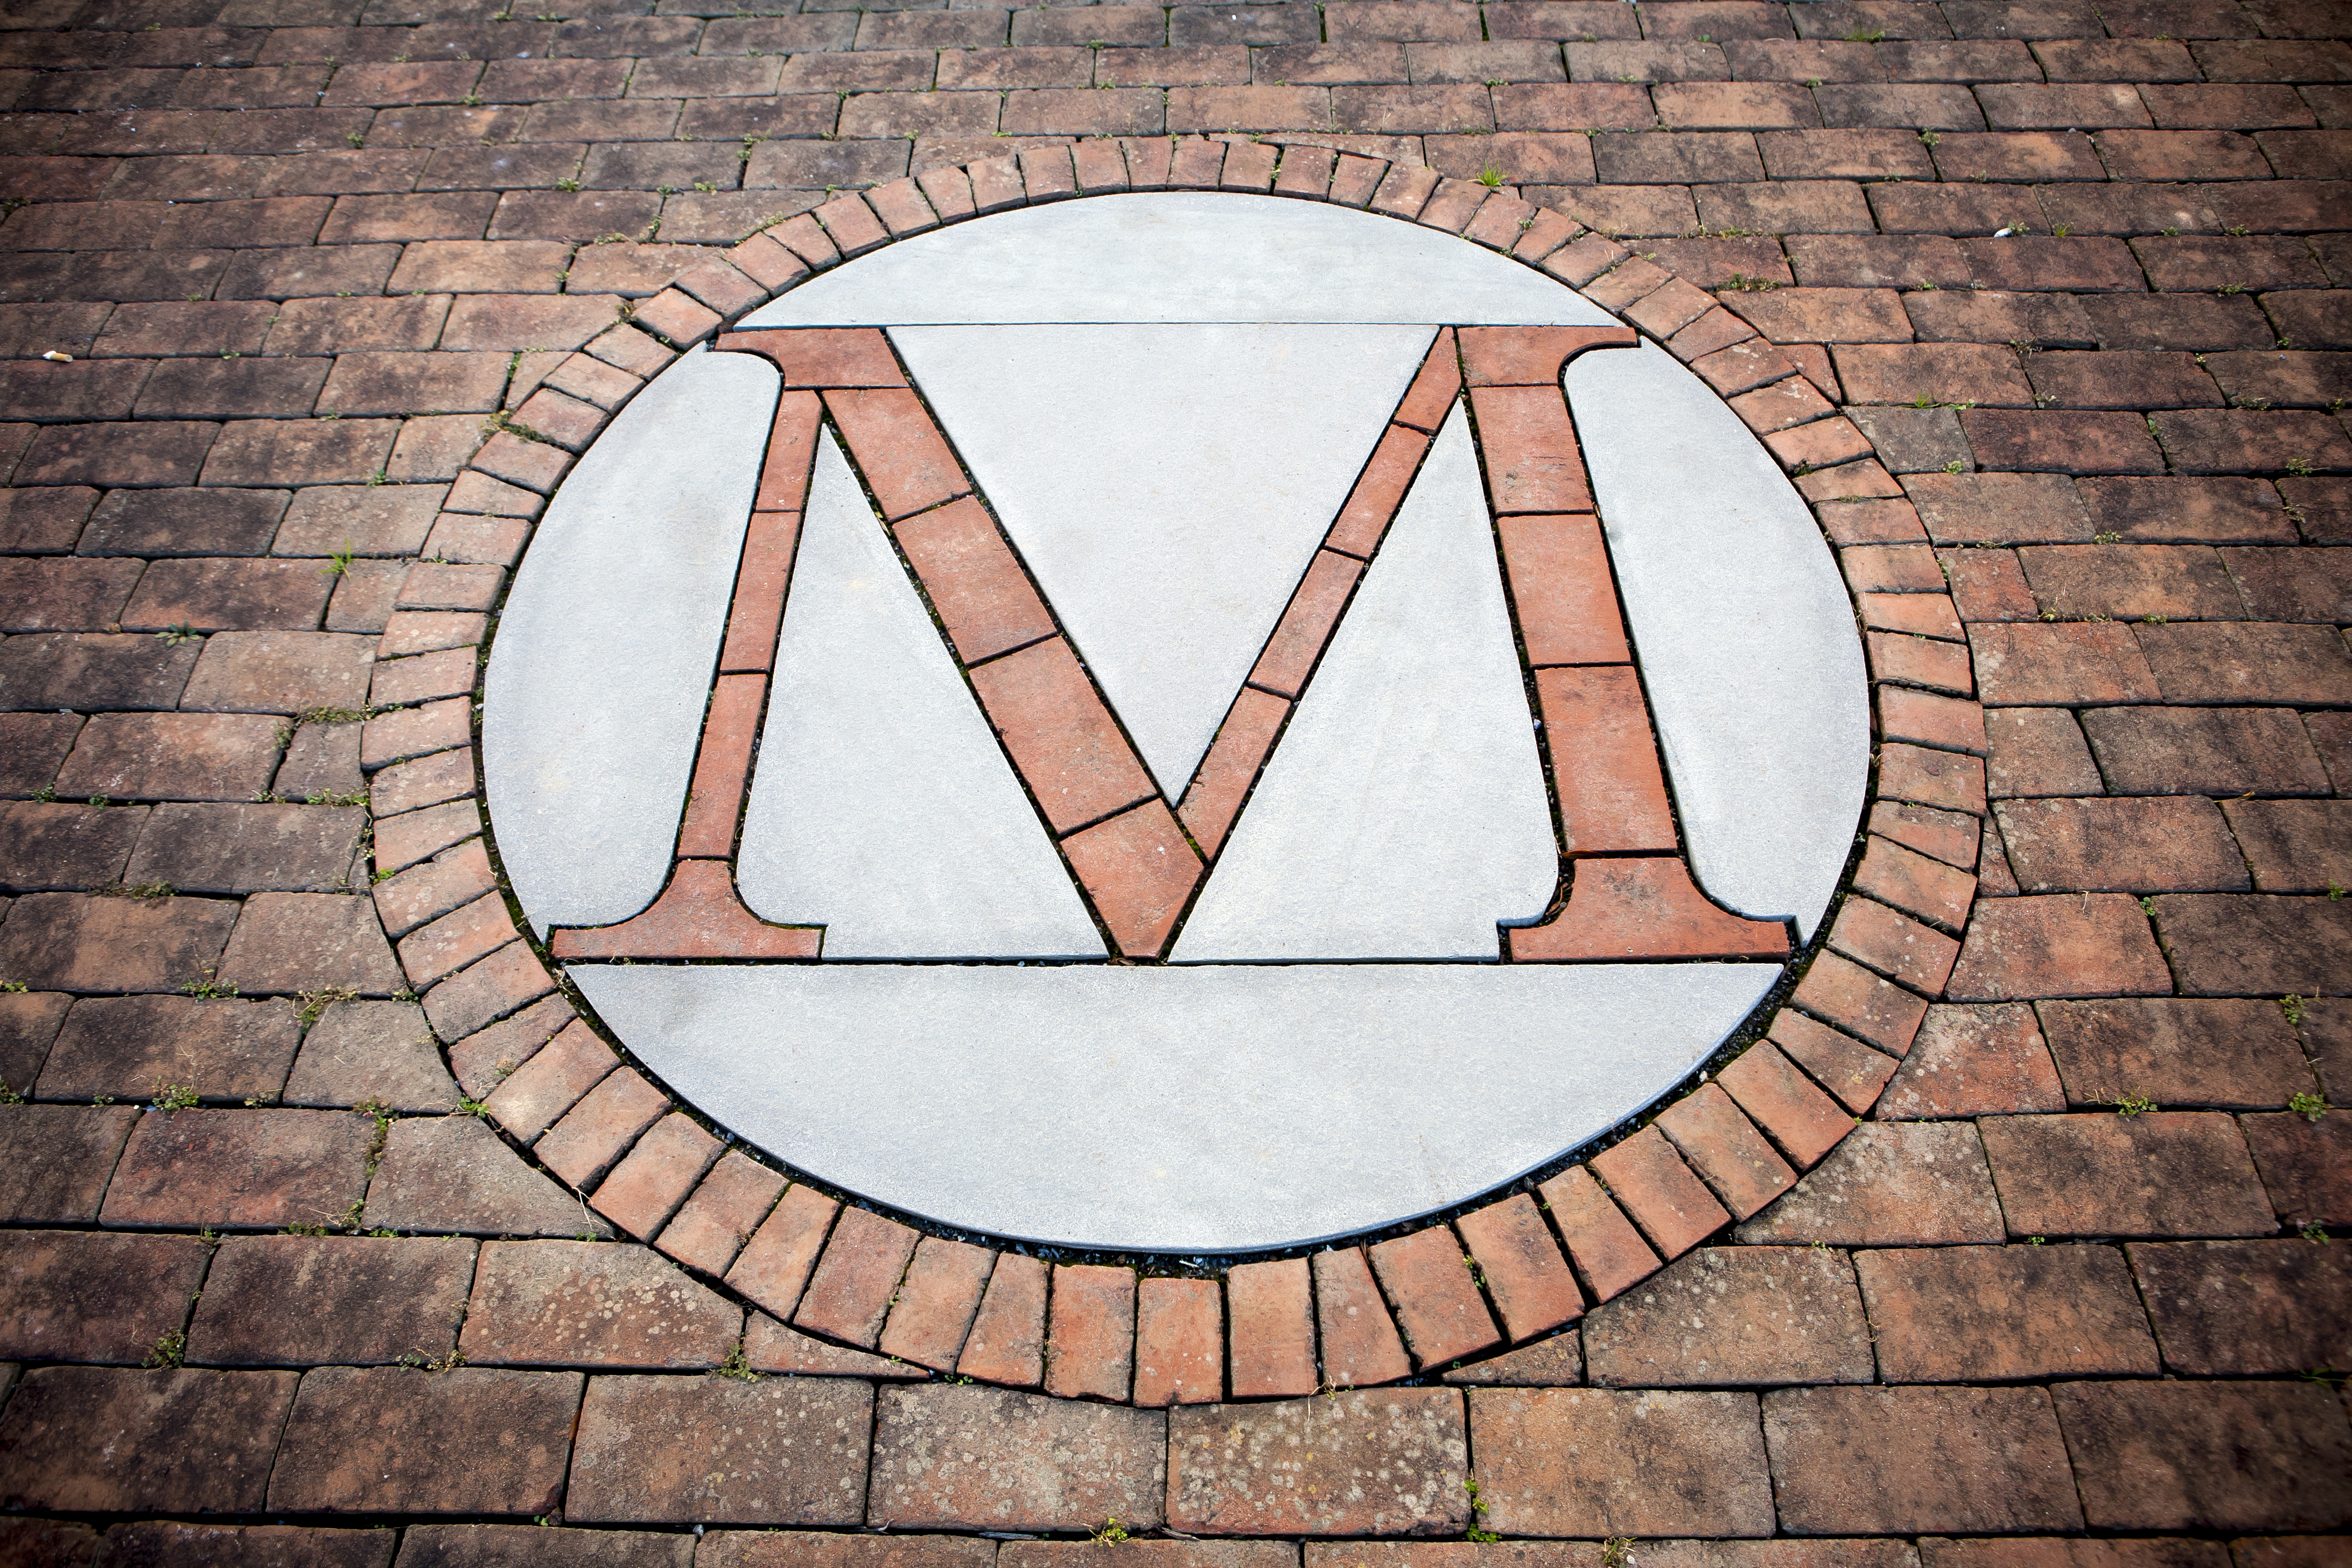 Brick M